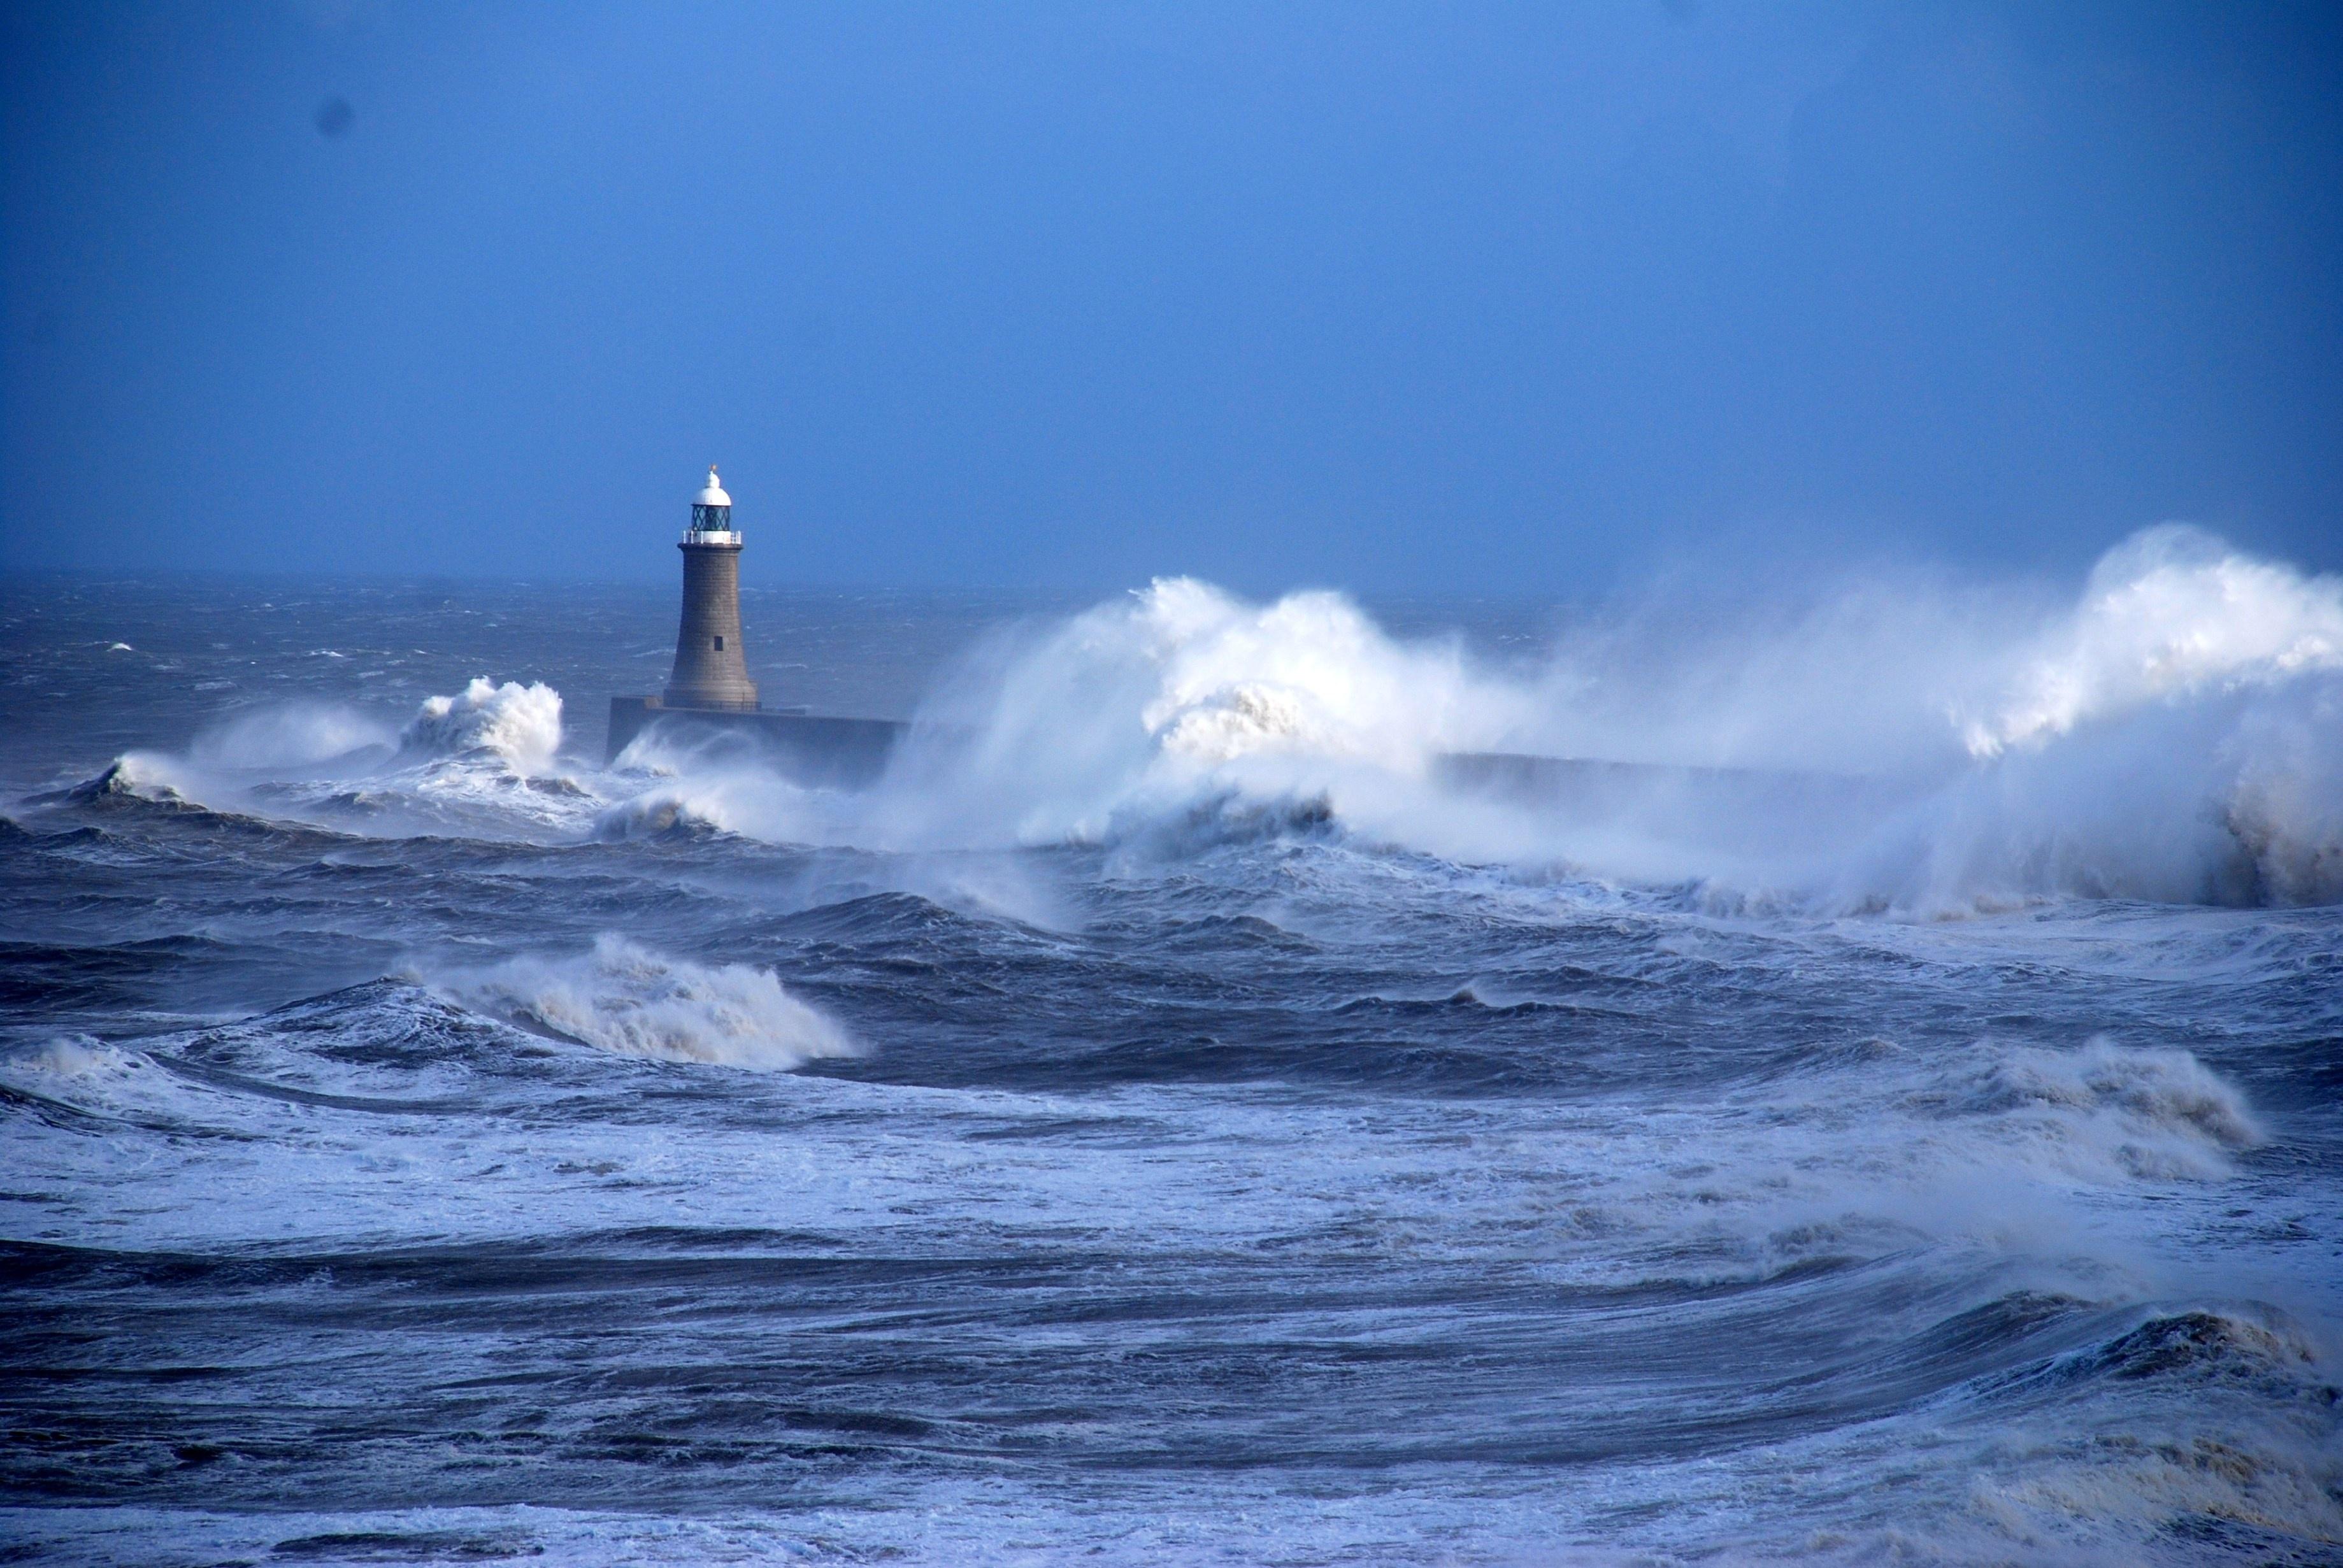 Океан и маяк картинки любое